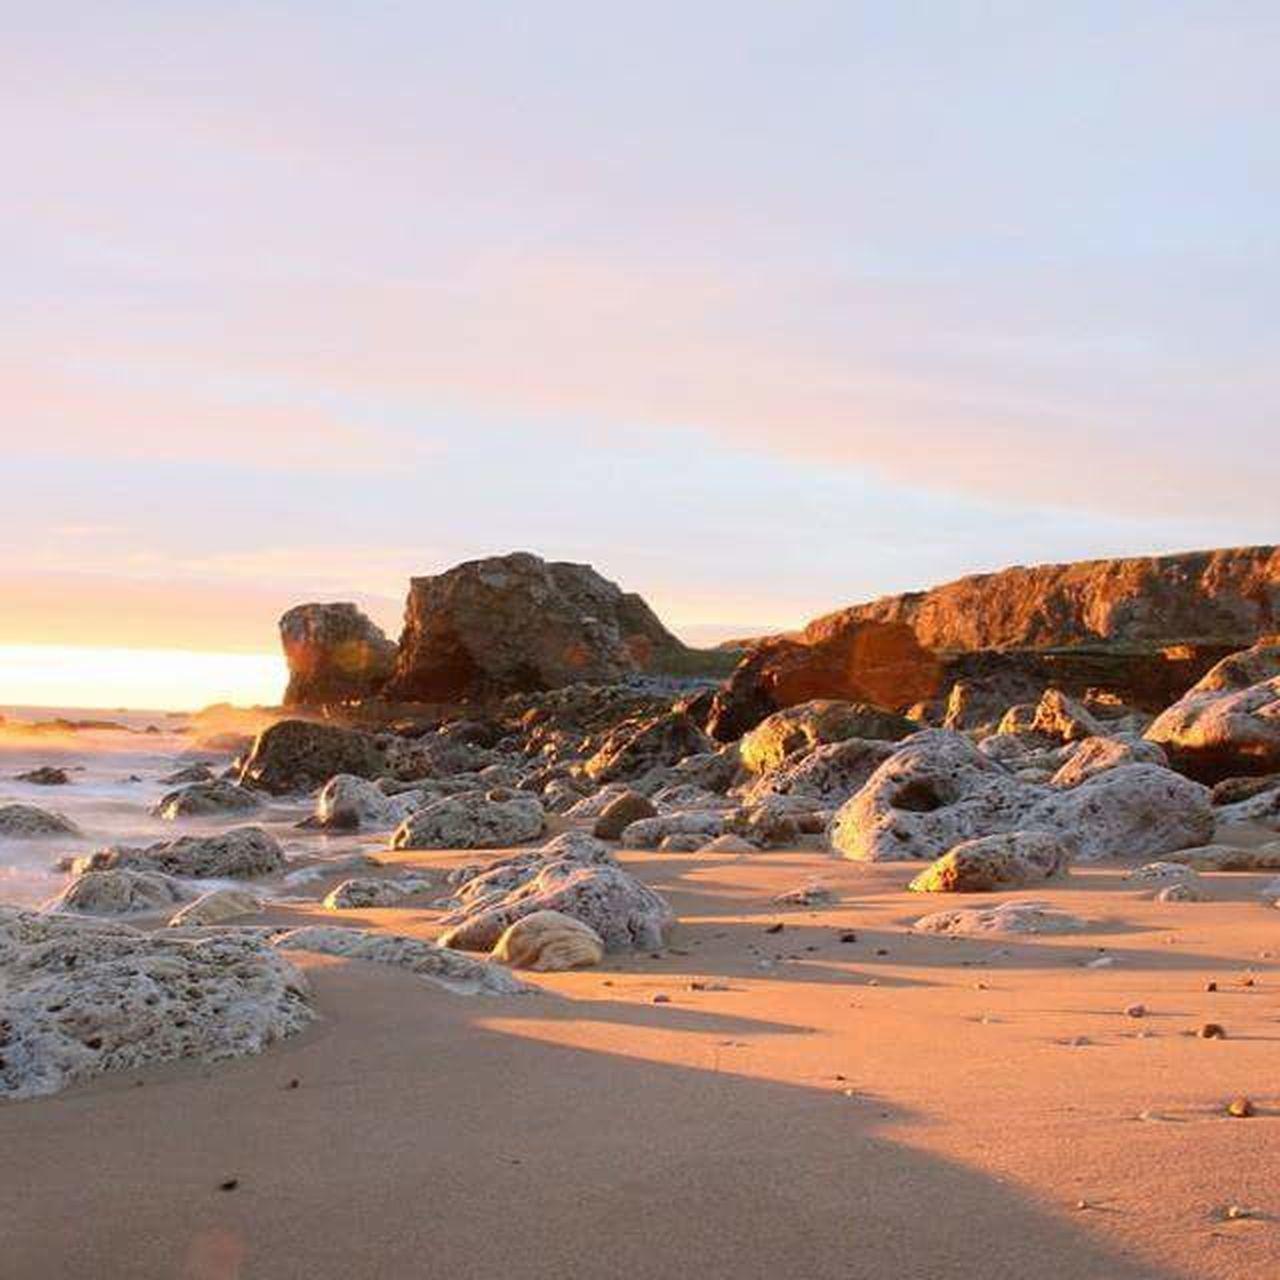 Sun sunrise seaside shoreline coastline coastal scene coast scenic reflections water sun ray sunbeam rock pebbles cliff sand shingle long exposure view tranquil calming relaxing nature fresh